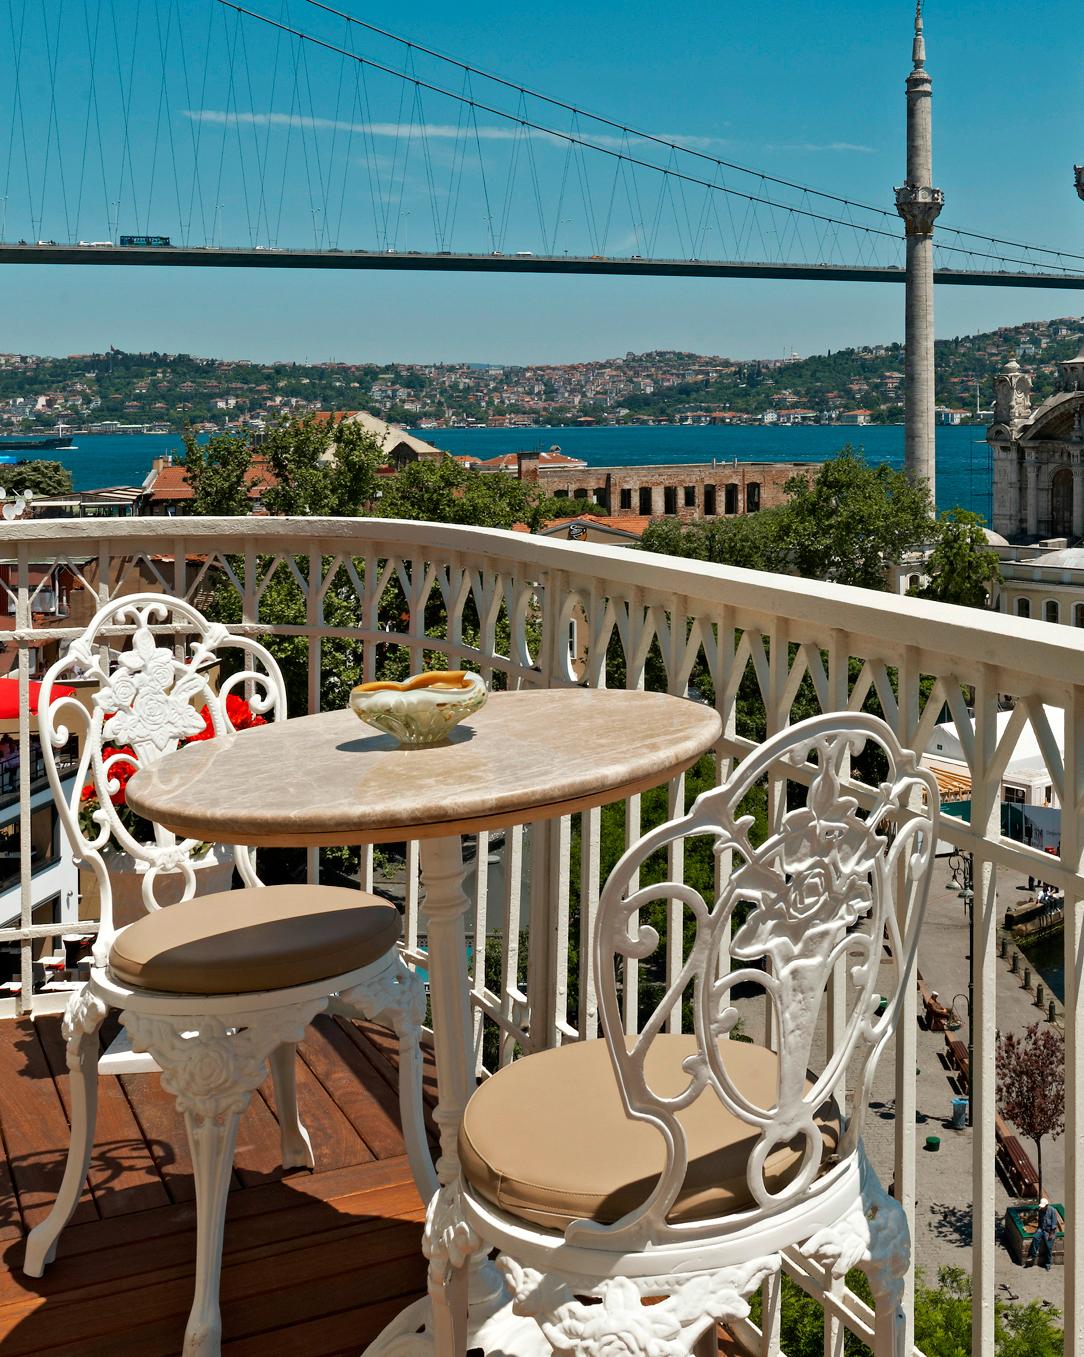 most-romantic-cities-honeymoon-istanbul-house-hotel-1015.jpg